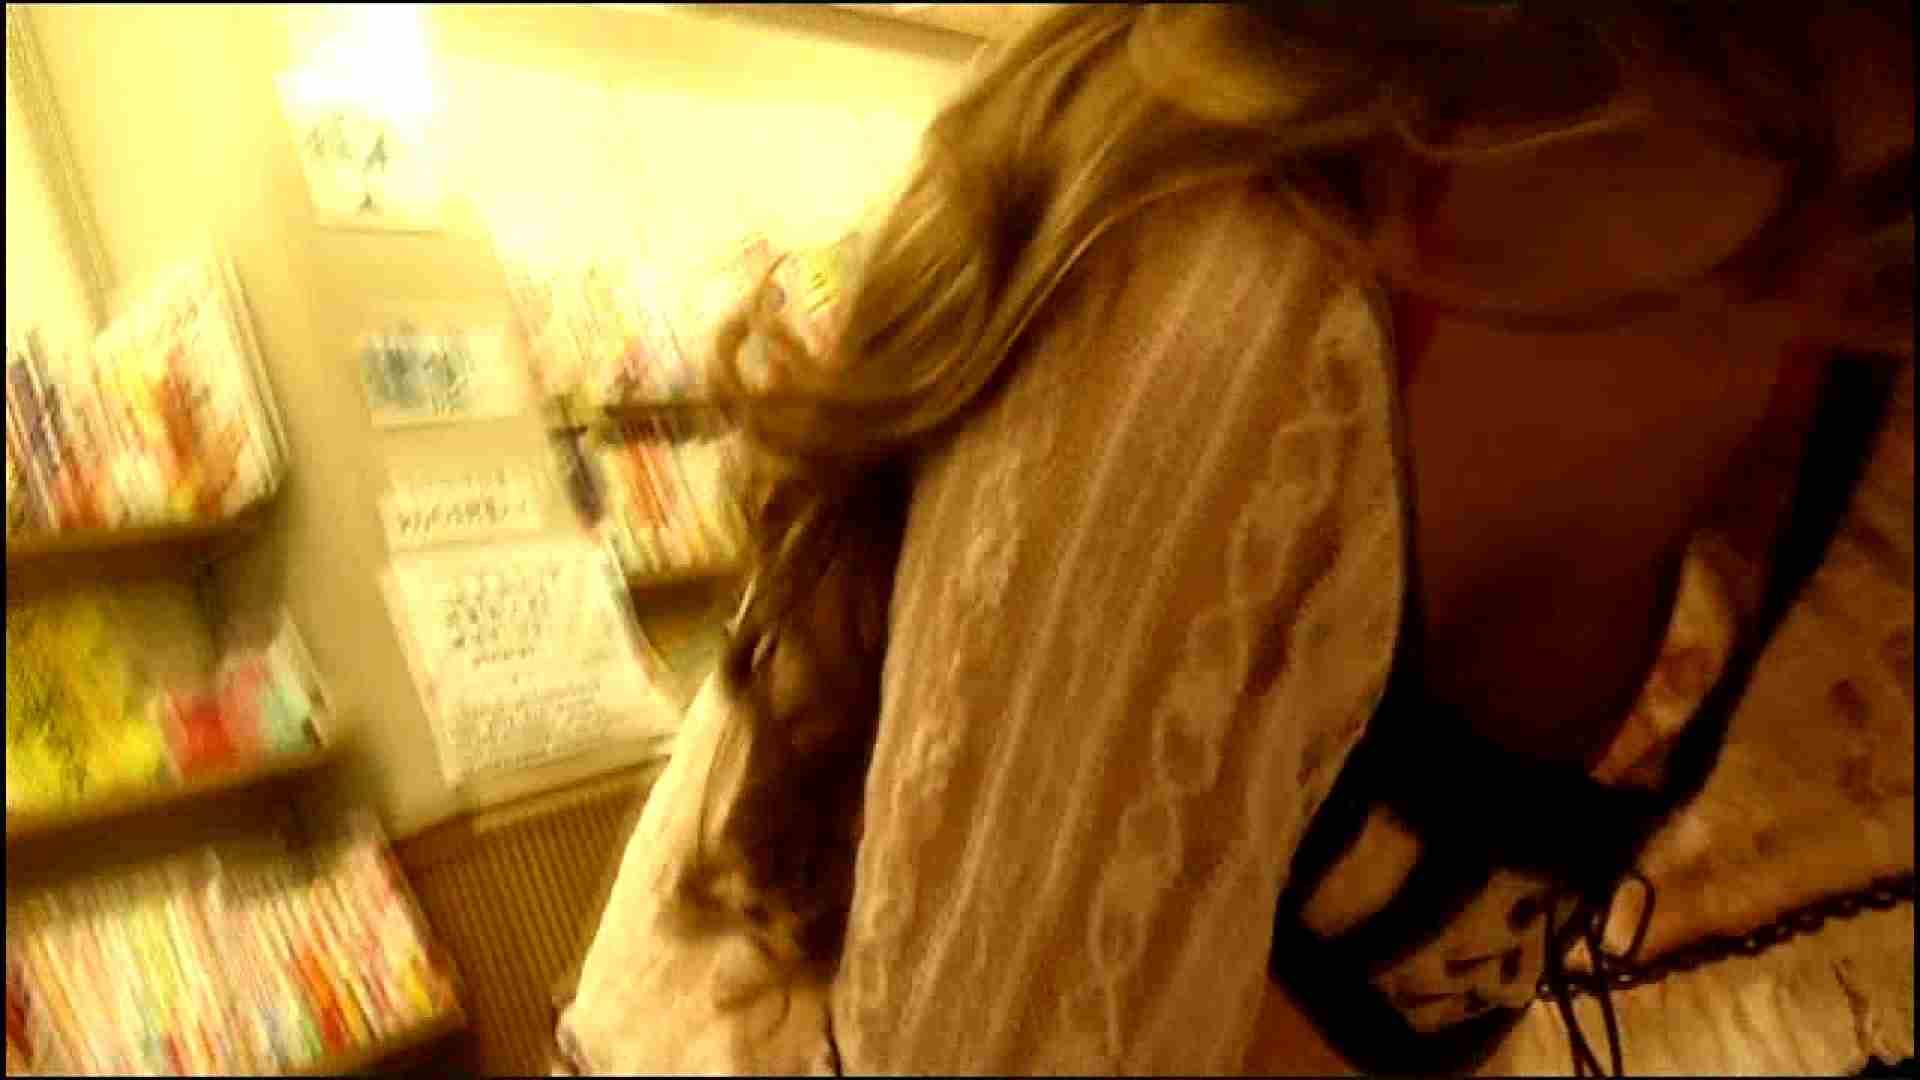 NO.2 本屋にいた巨乳ギャル 胸チラ・のぞき ぱこり動画紹介 95枚 91